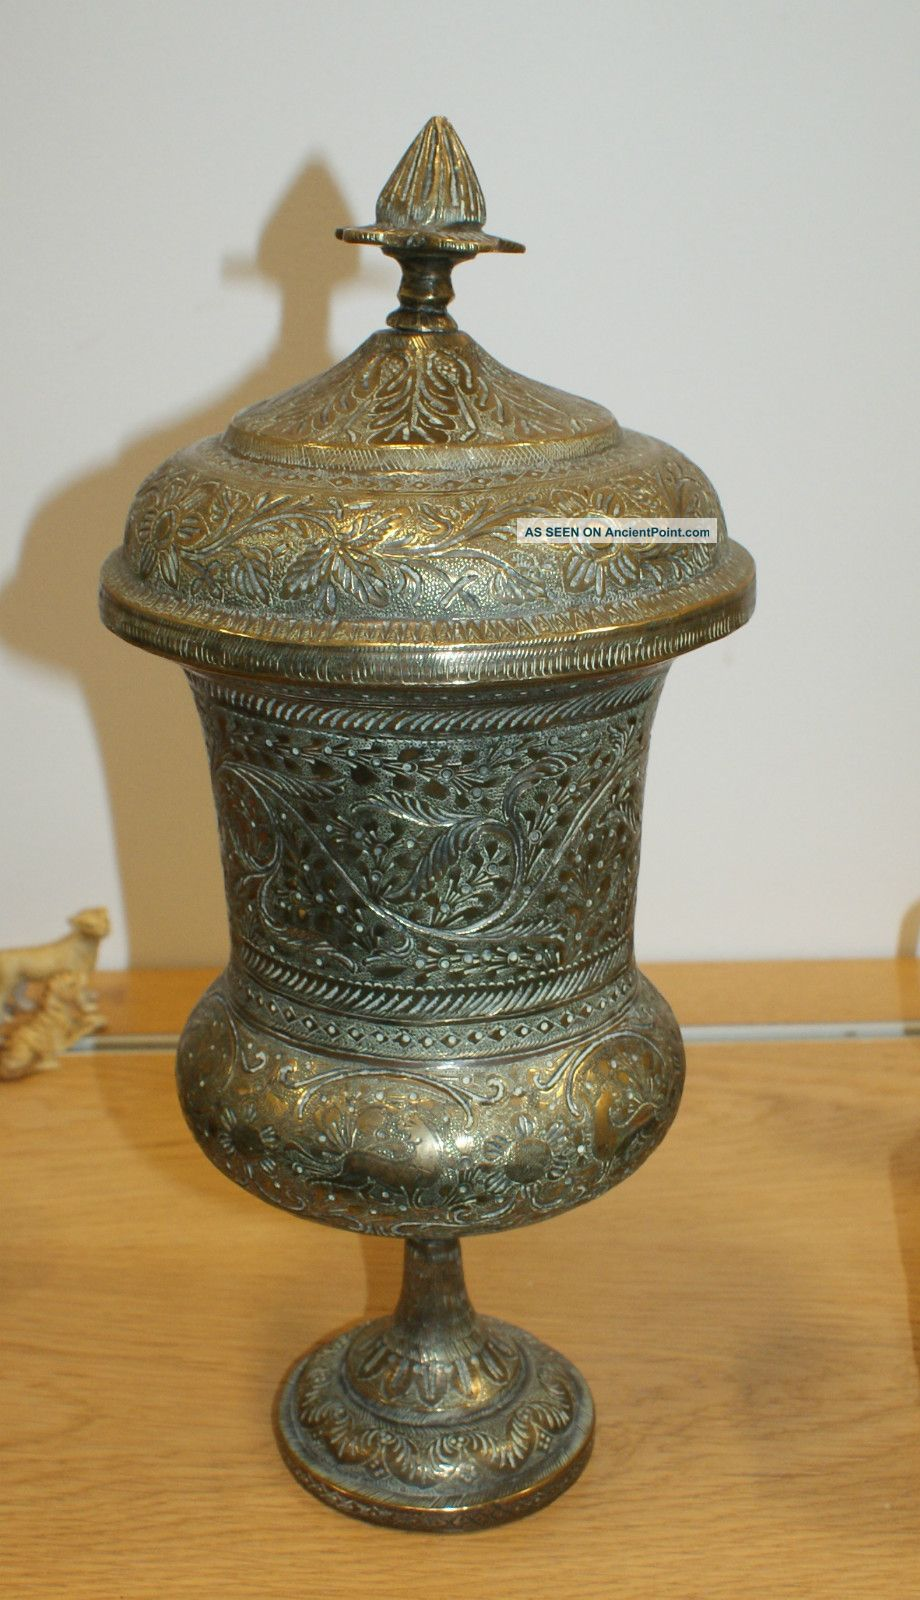 Large antique brass vase cup cover urn middle east engraved large antique brass vase cup cover urn middle east engraved designs india asia reviewsmspy